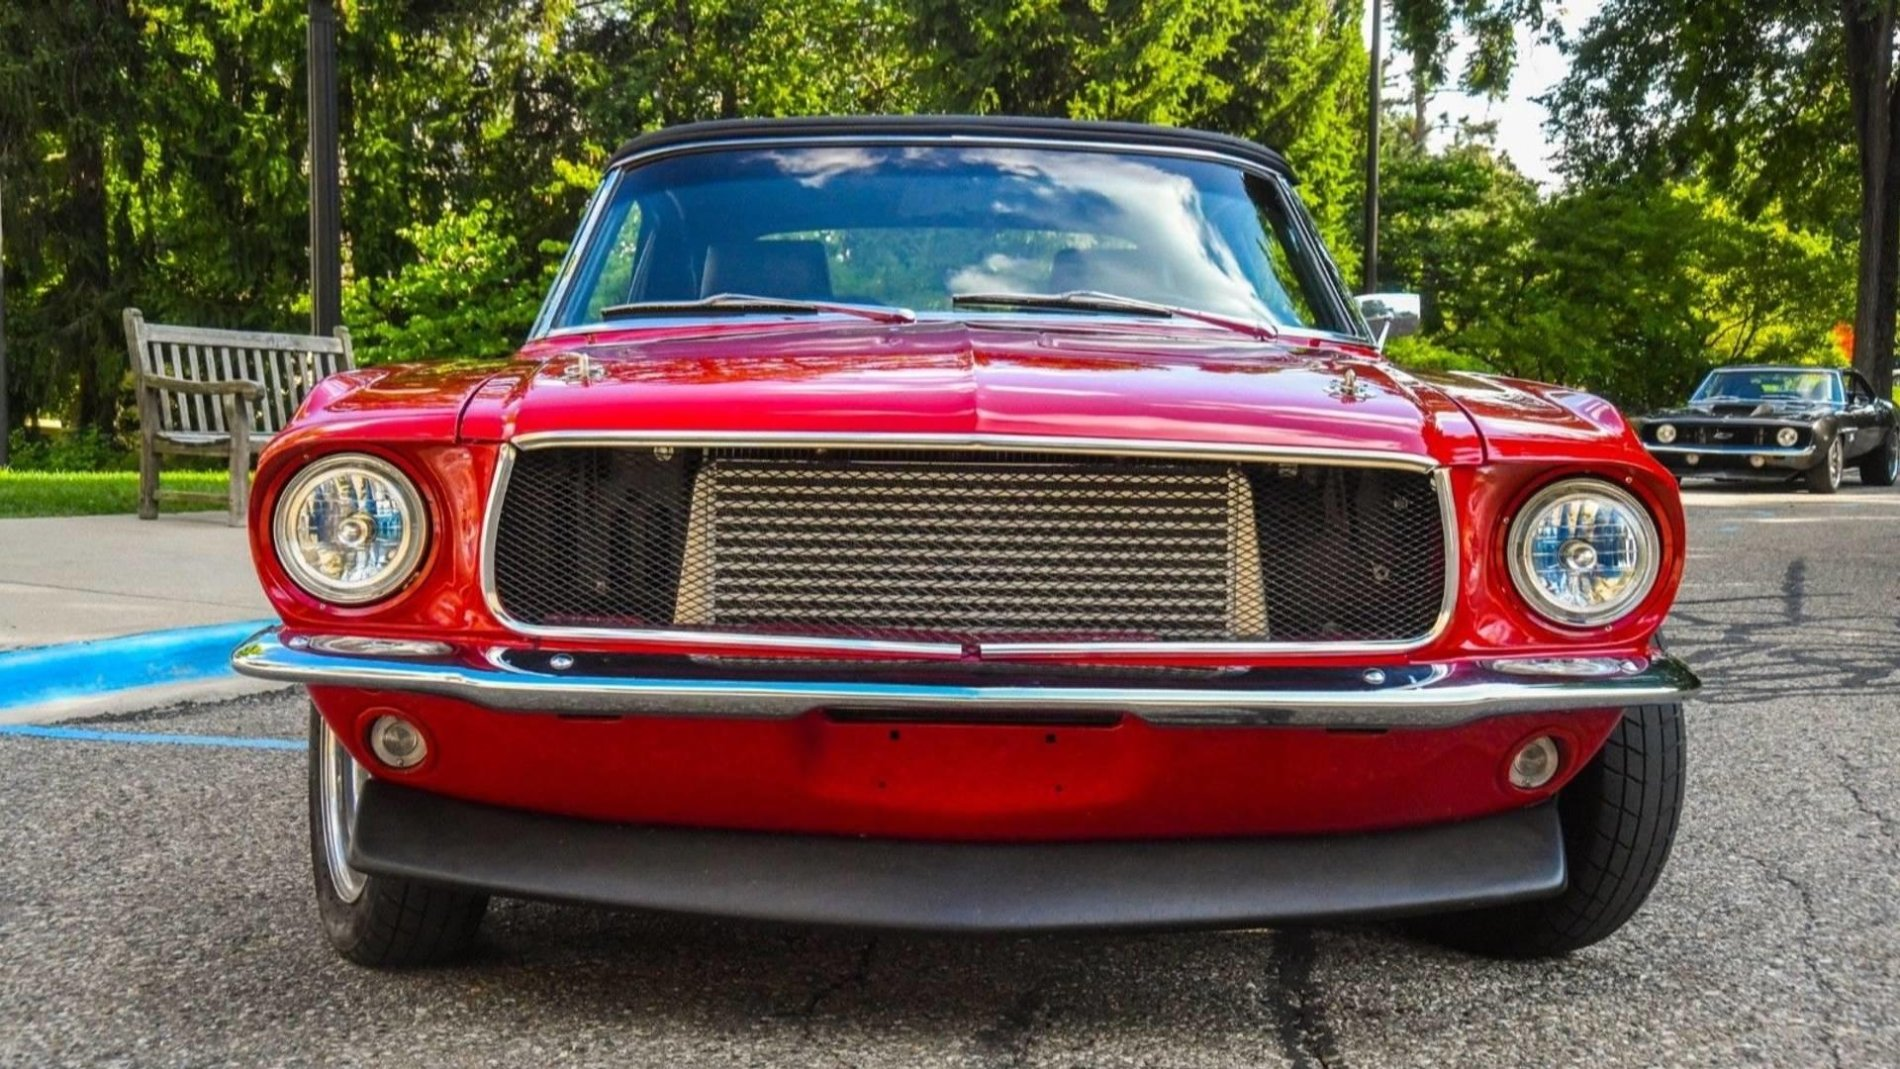 Ford Mustang cu motor 2JZ - Ford Mustang cu motor 2JZ